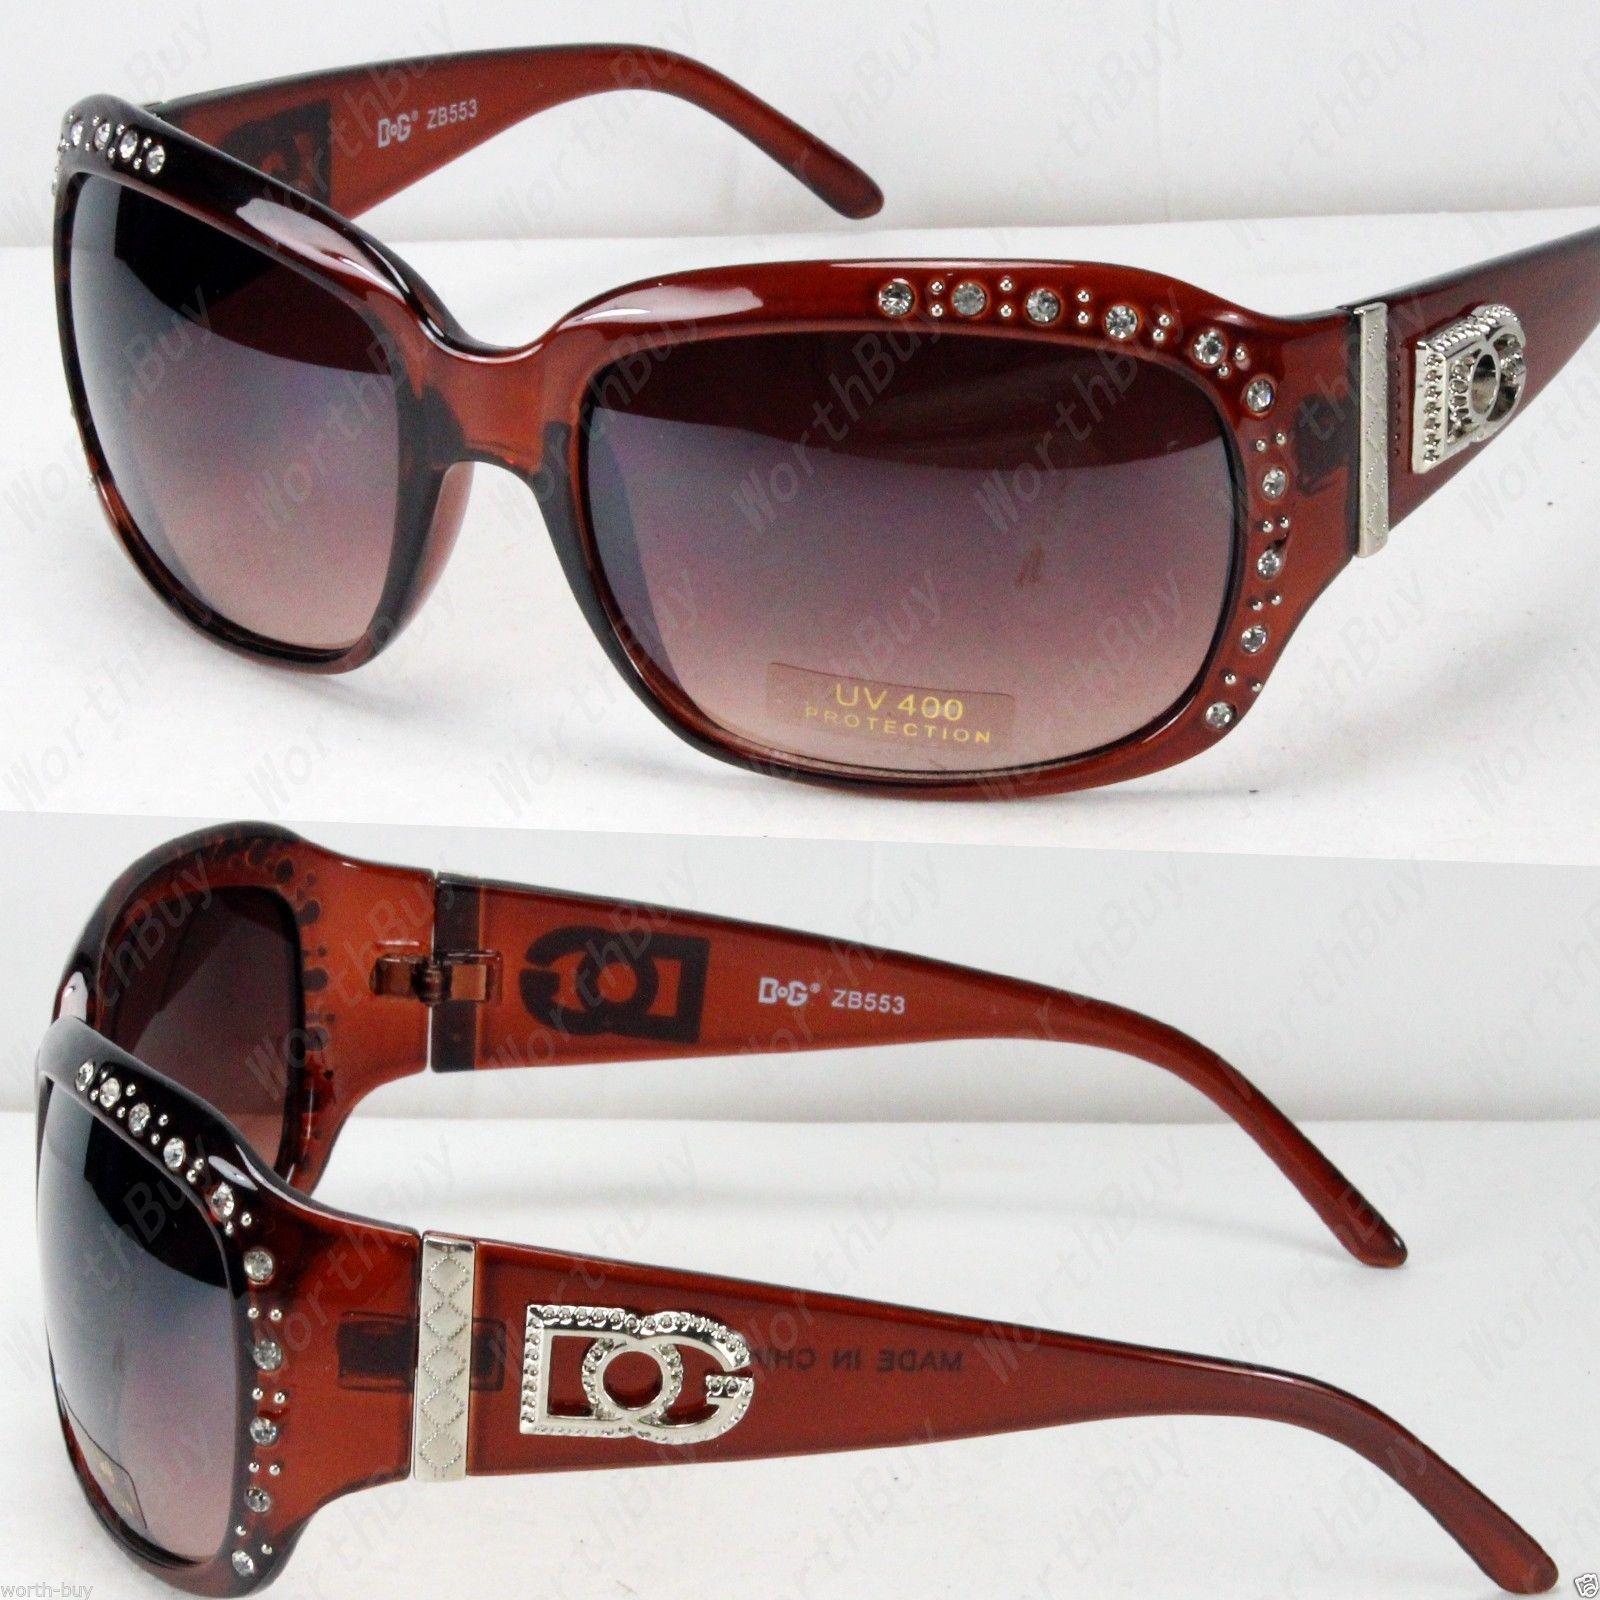 7696fc2ceb5 New Dg Designer Womens Rhinestones Sunglasses Shade Fashion Brown